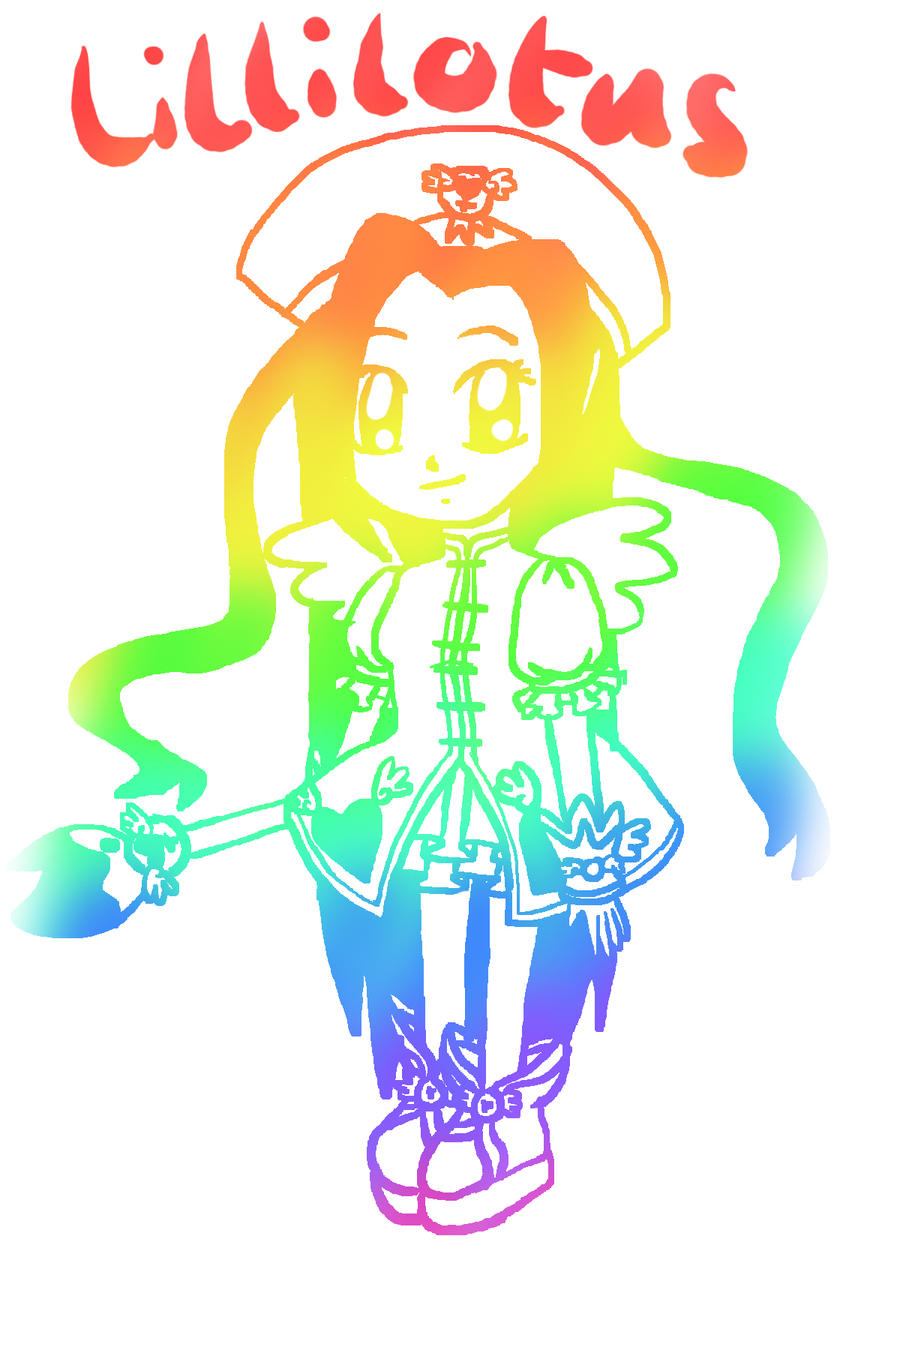 Rainbow Art: Lillilotus by lillilotus